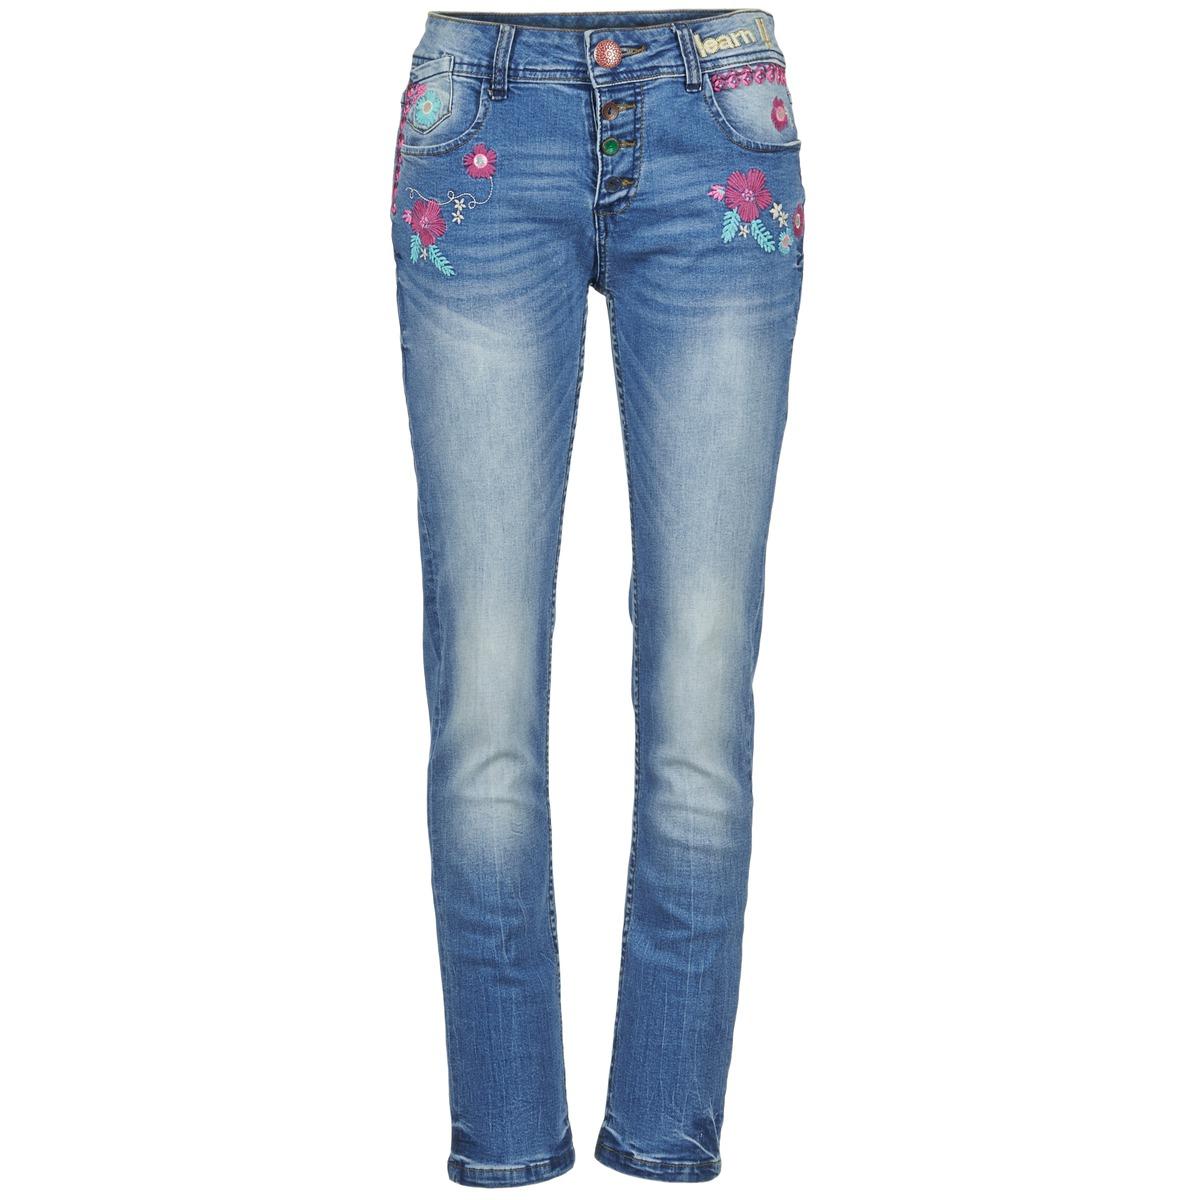 jeans droit desigual eloije bleu medium jeans femme. Black Bedroom Furniture Sets. Home Design Ideas